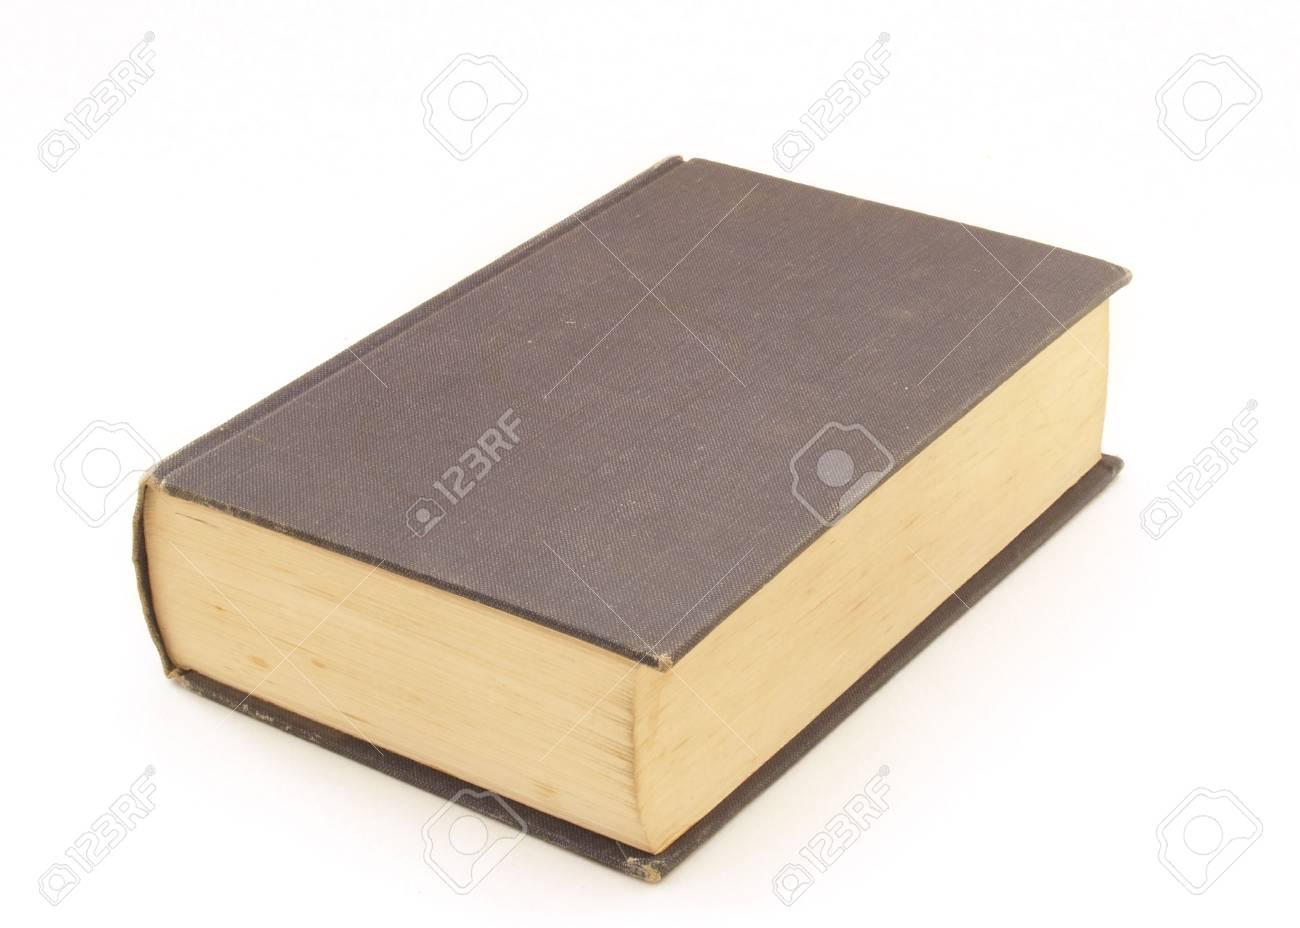 Hardback book on a white background Stock Photo - 624736